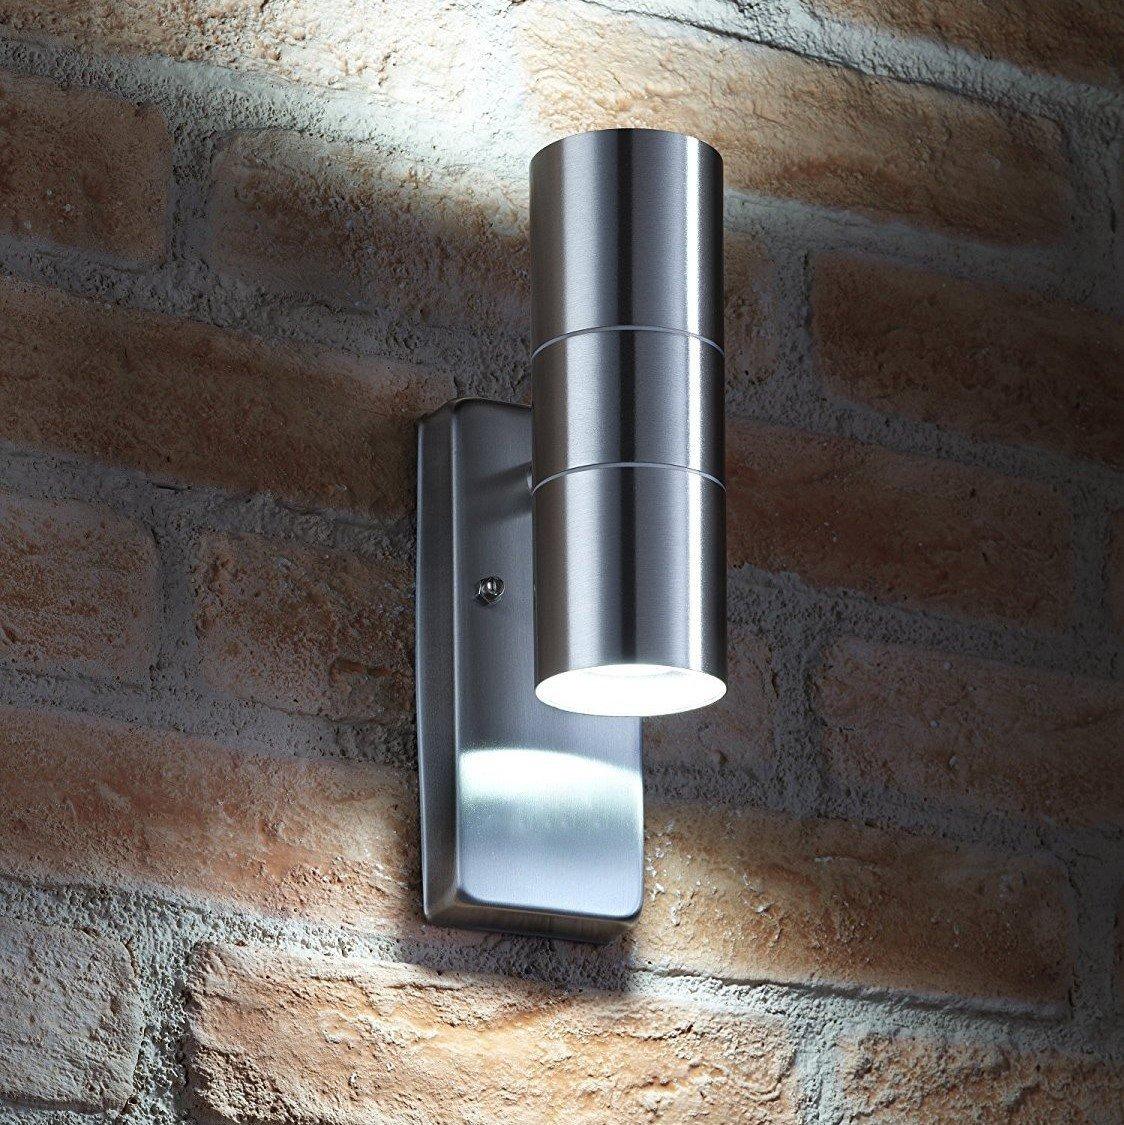 Auraglow Dusk Till Dawn Sensor Stainless Steel Up & Down Outdoor Wall Security Light - Cool White [Energy Class A+]